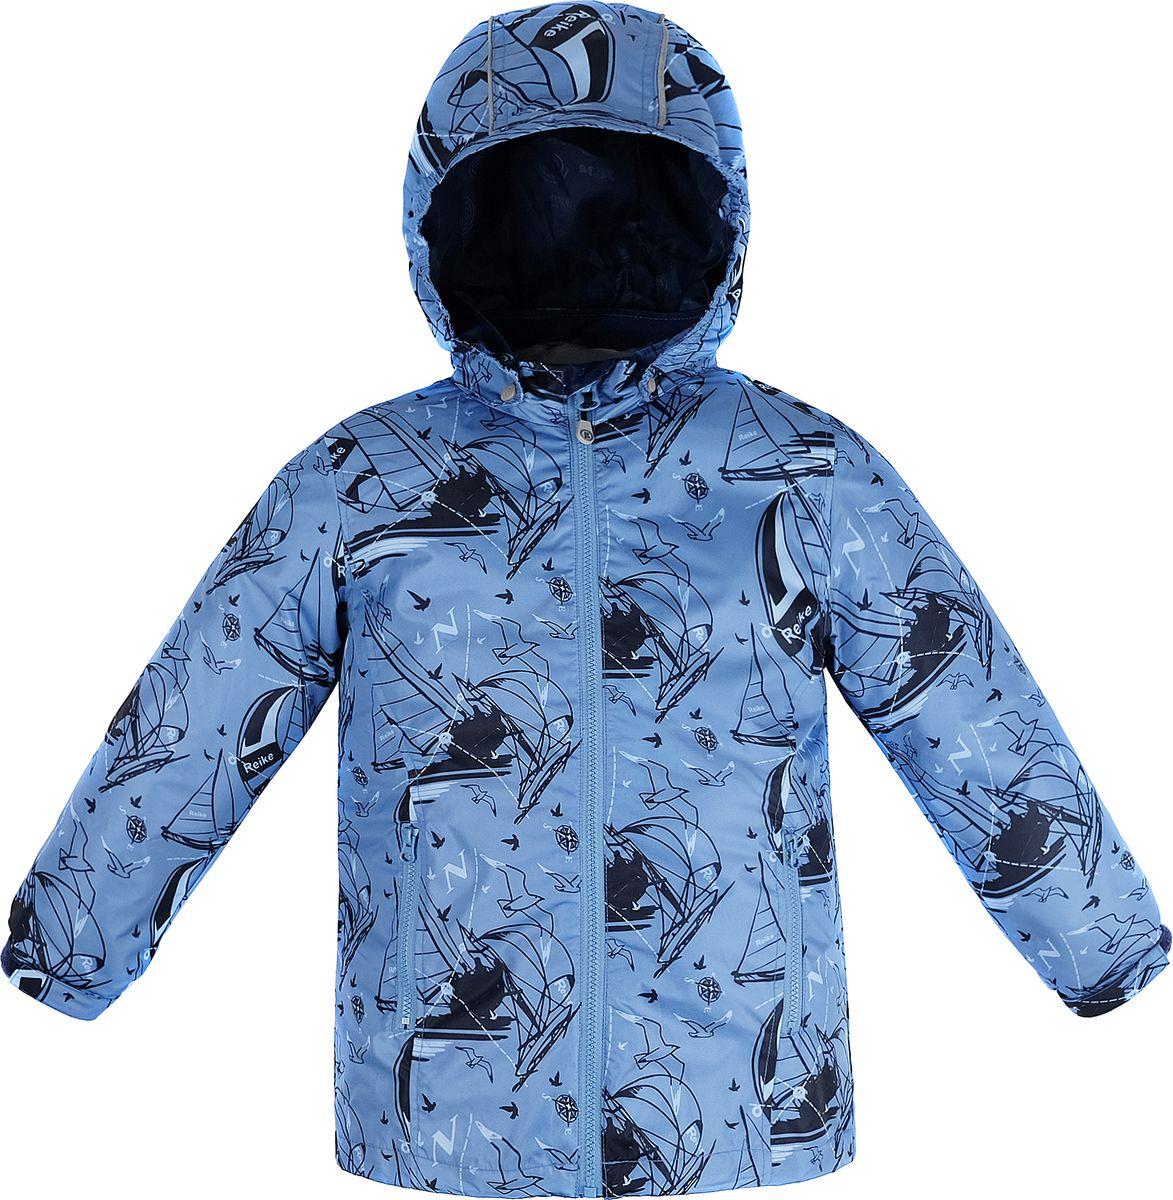 Куртка для мальчика Reike, цвет: синий. 40 900 130_YAHT(FL) blue. Размер 152, 12 лет40 900 130_YAHT(FL) blue